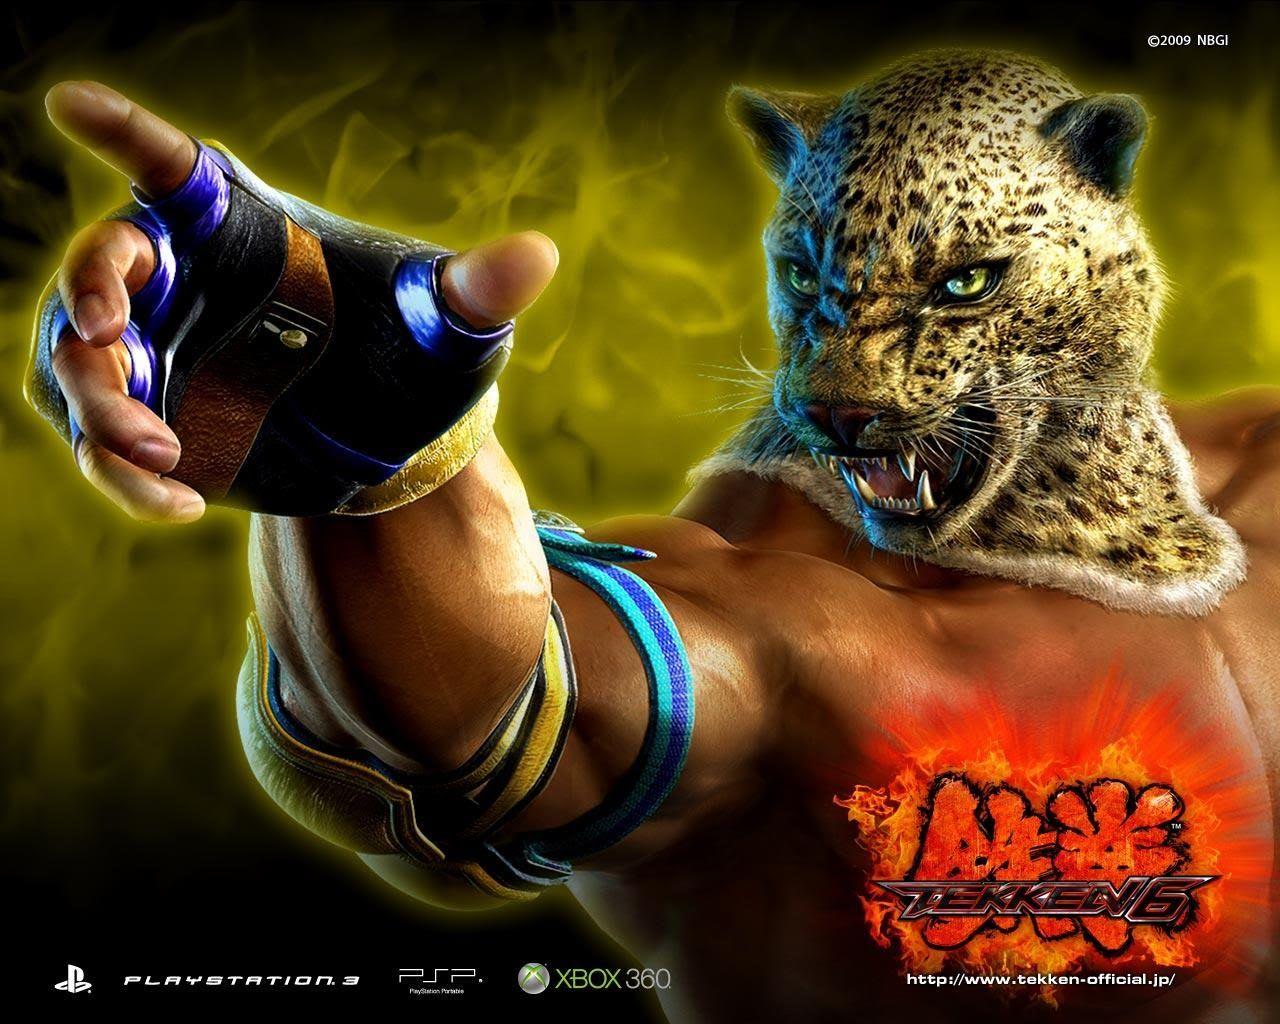 Tekken Wallpaper King Gallery Legendary Warriors Circus Animals